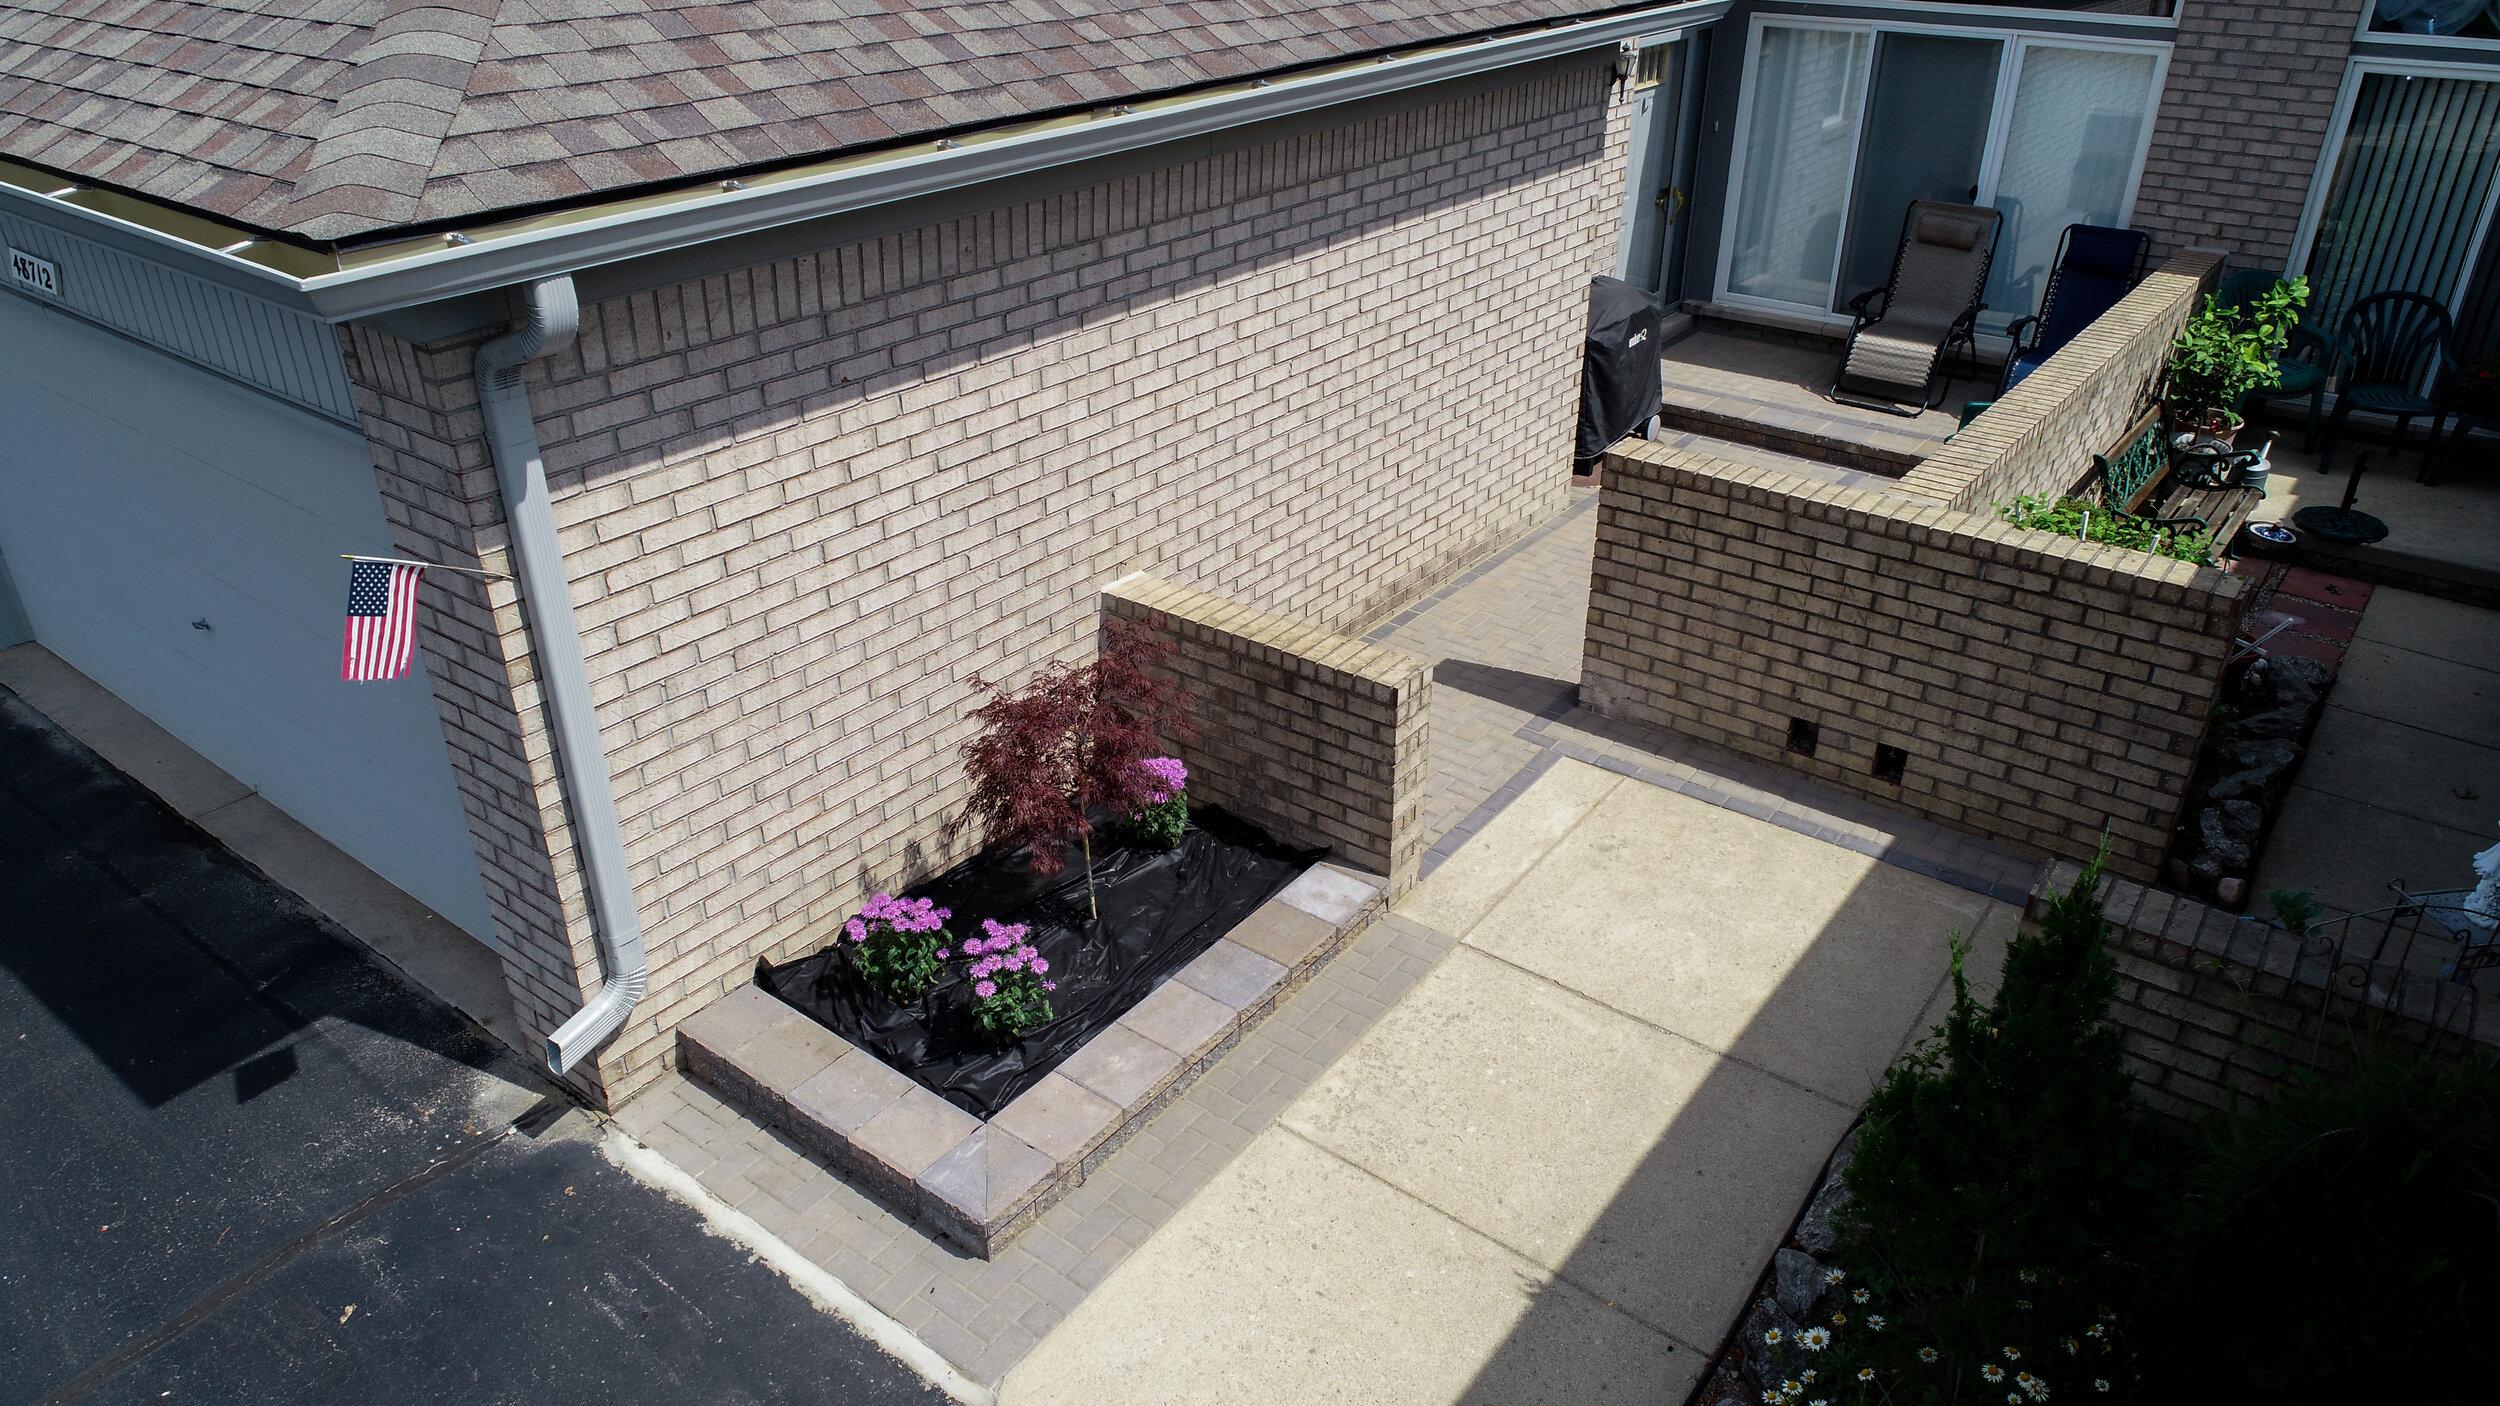 Unique Brick Pavers for Small Patios in Macomb Township, MI